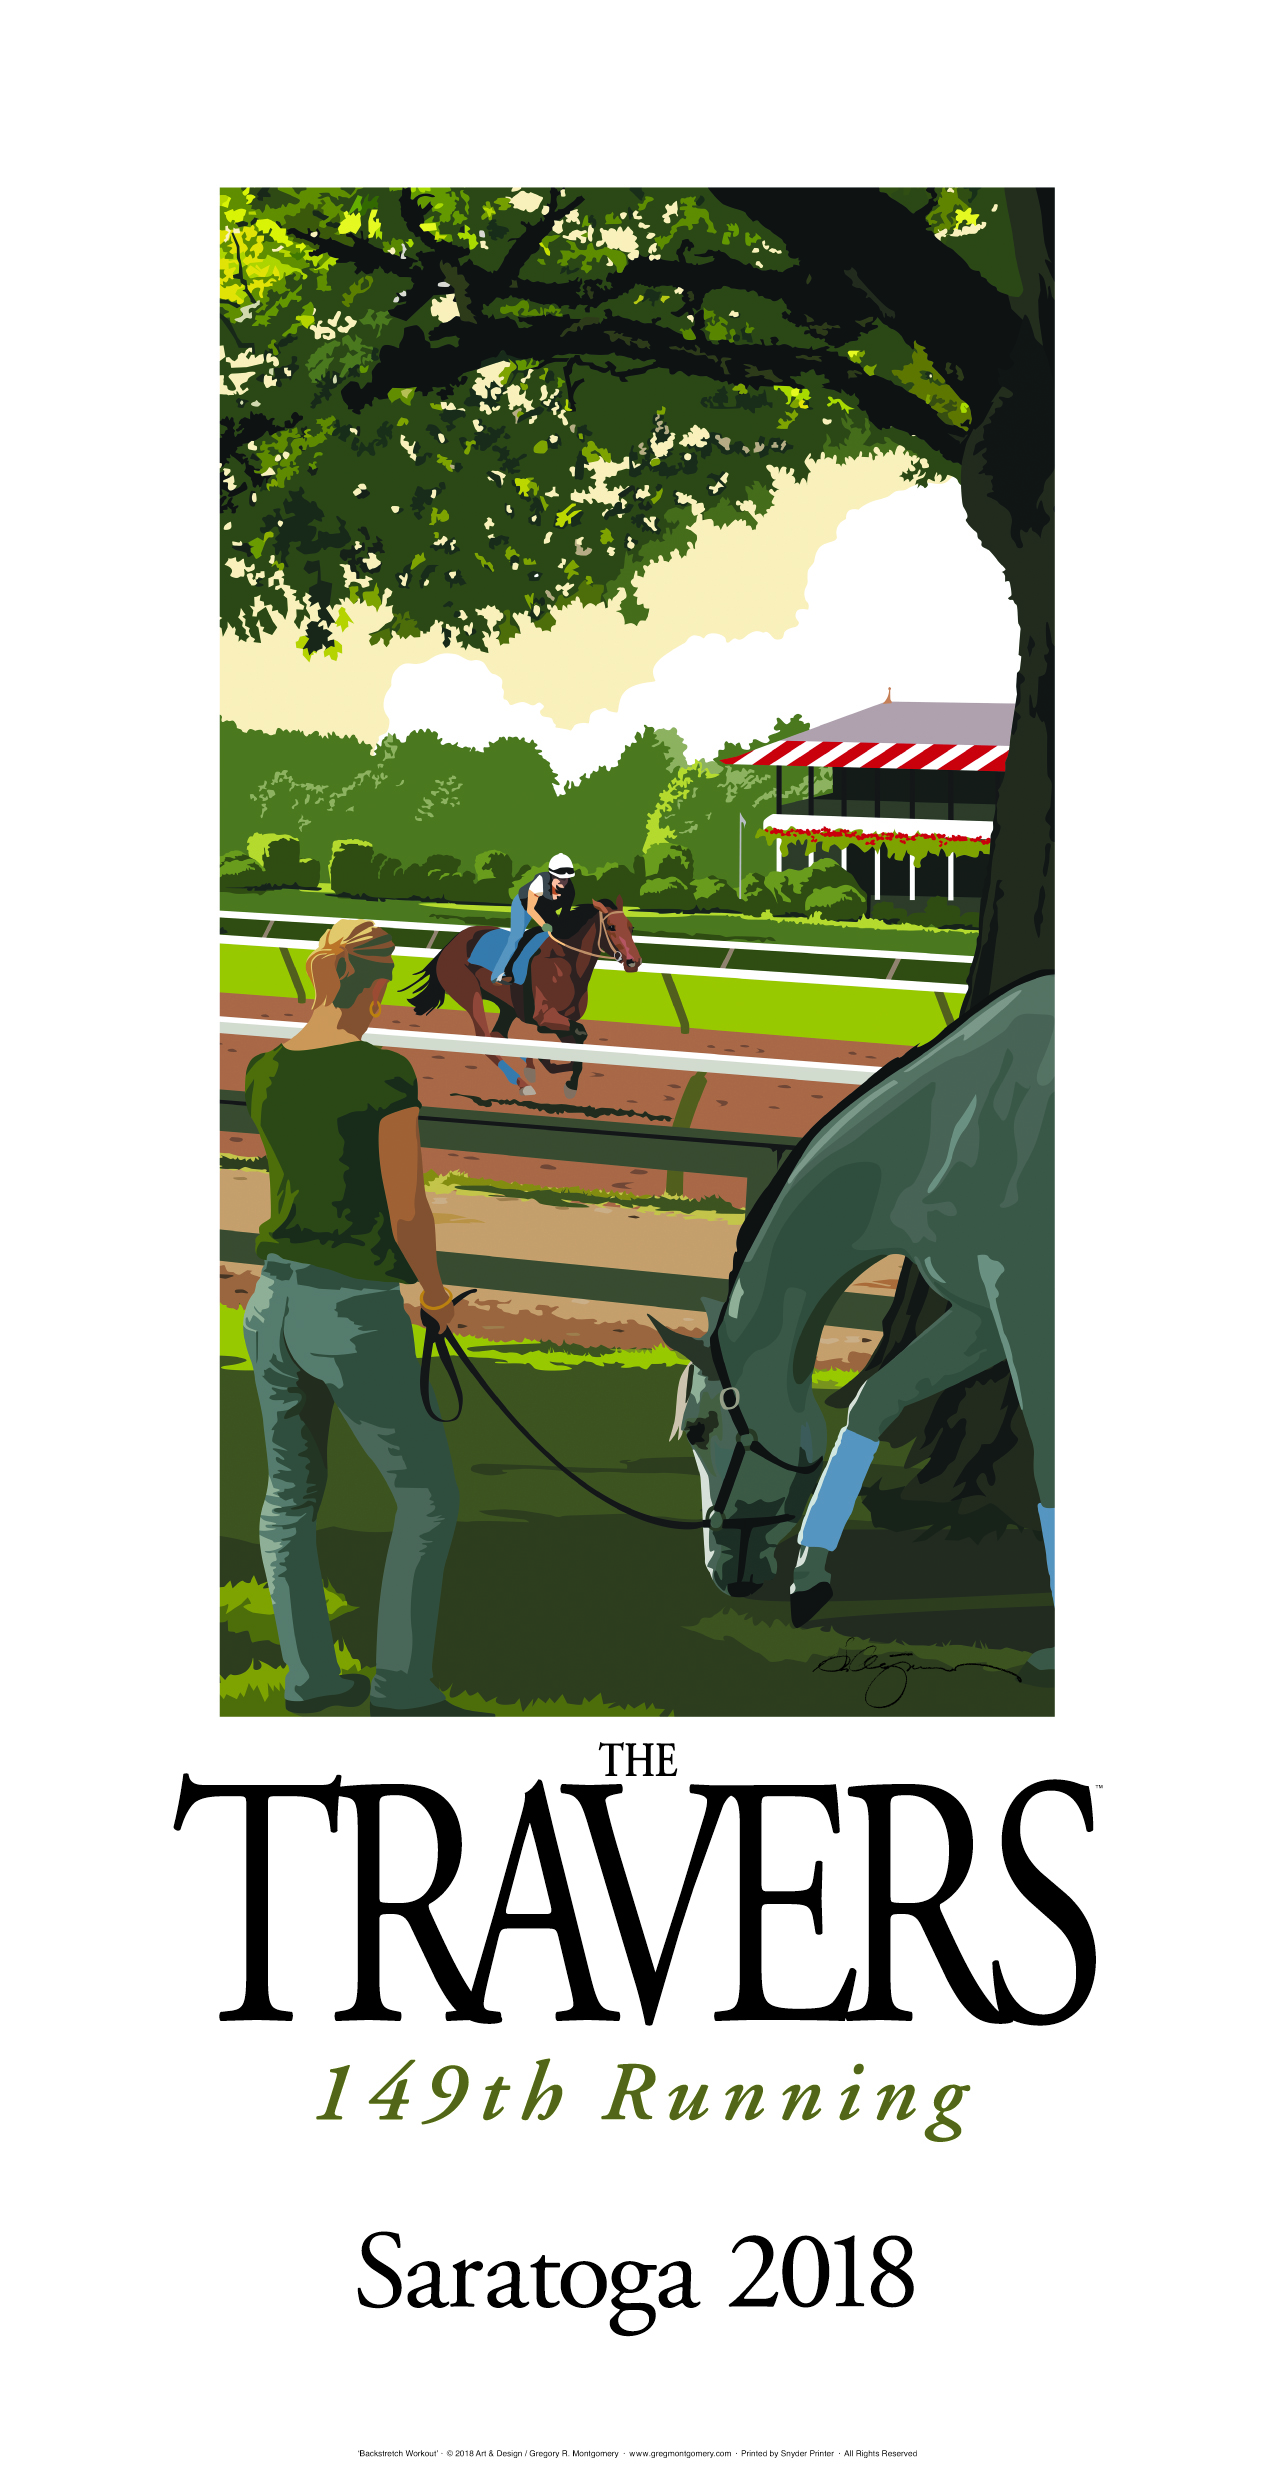 2018 Travers